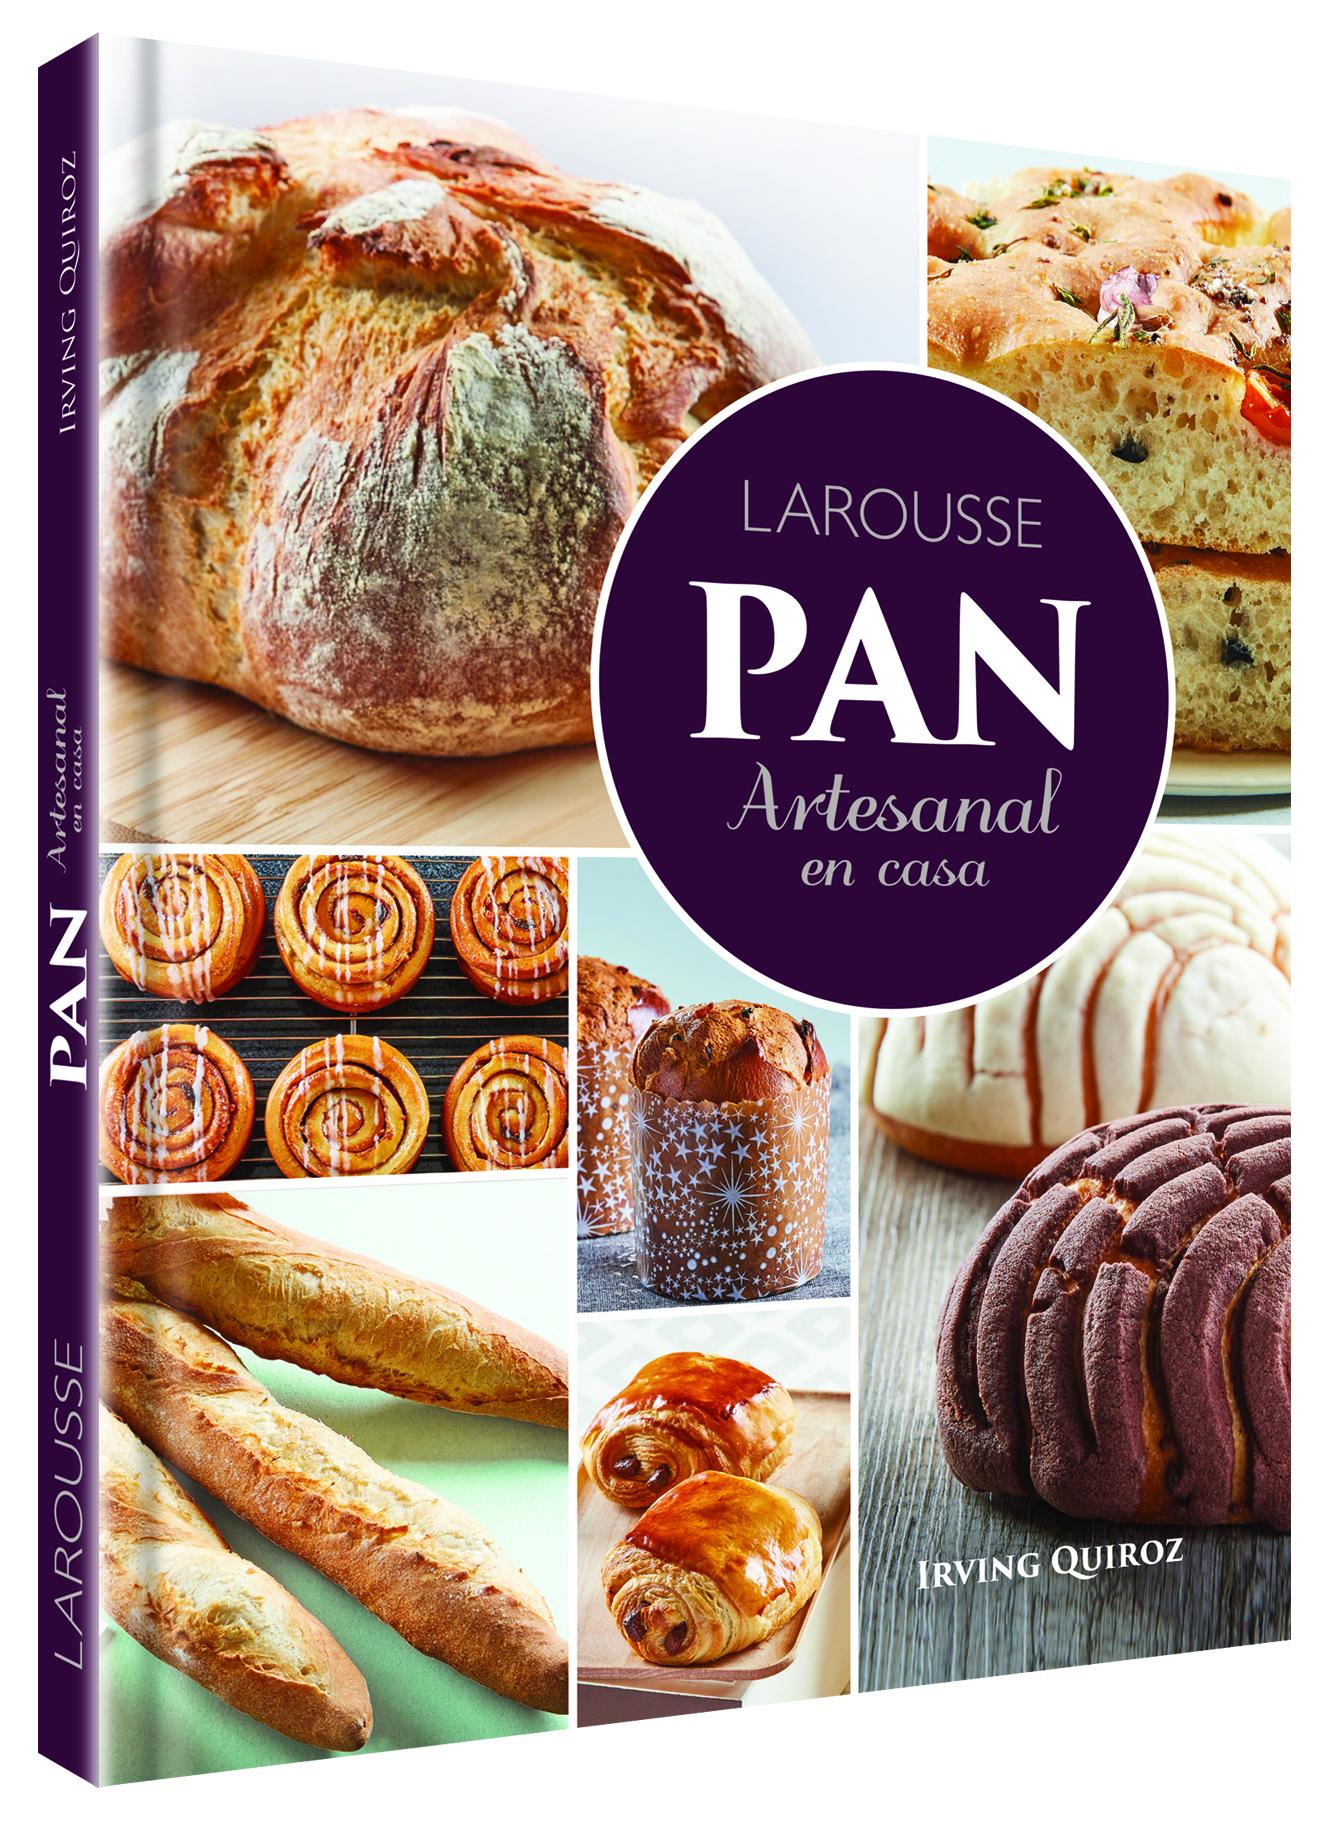 Pan artesanal en casa